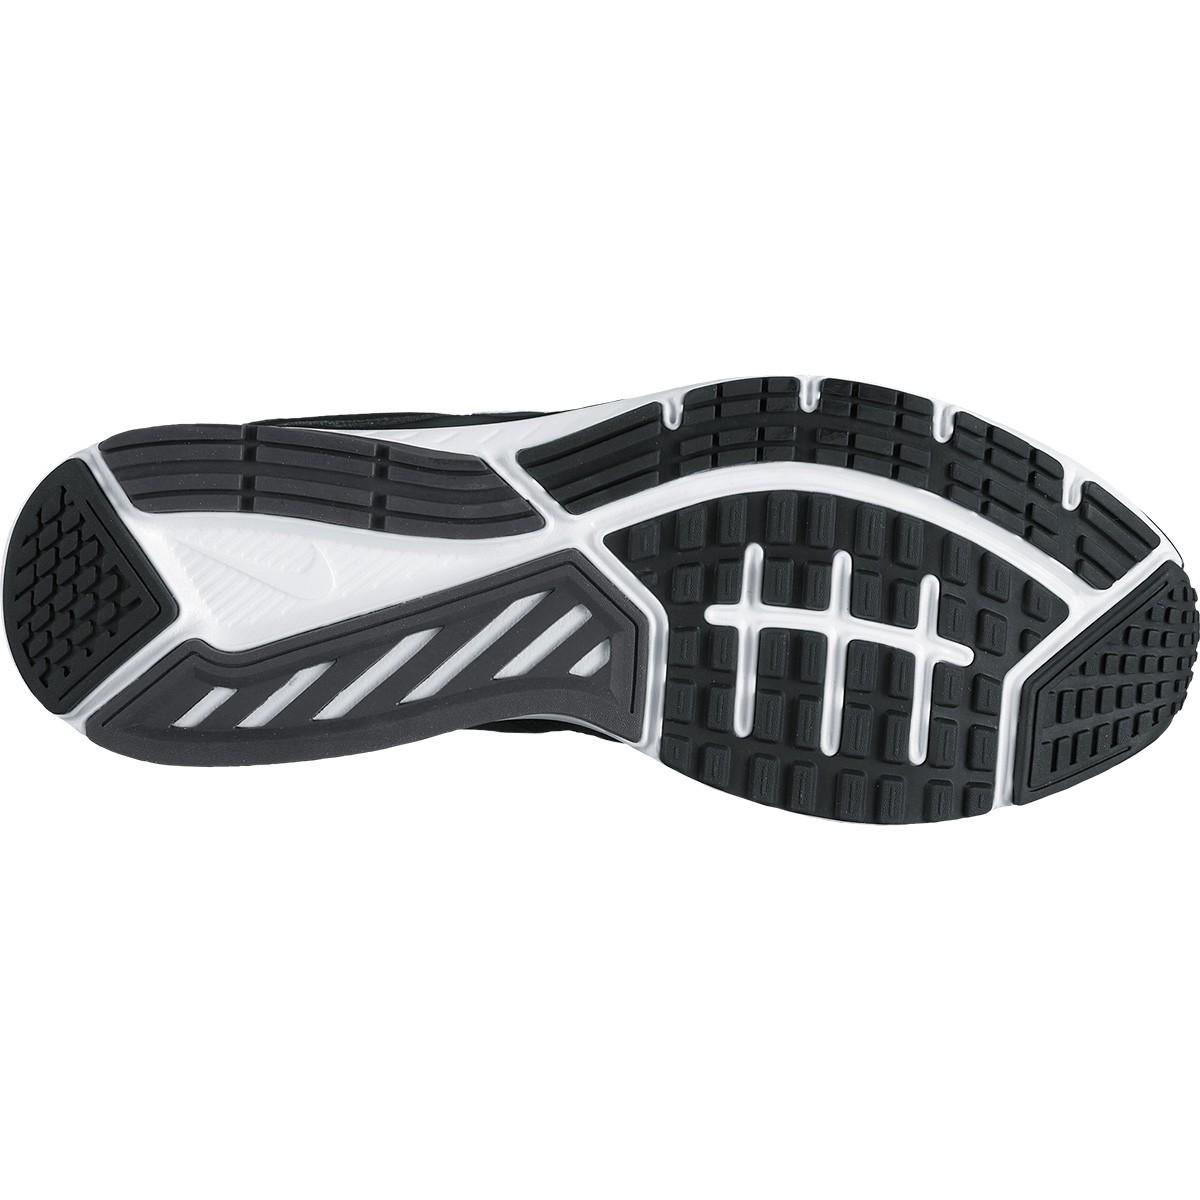 Tênis Nike Dart 12 MSL Masculino - Preto e Branco